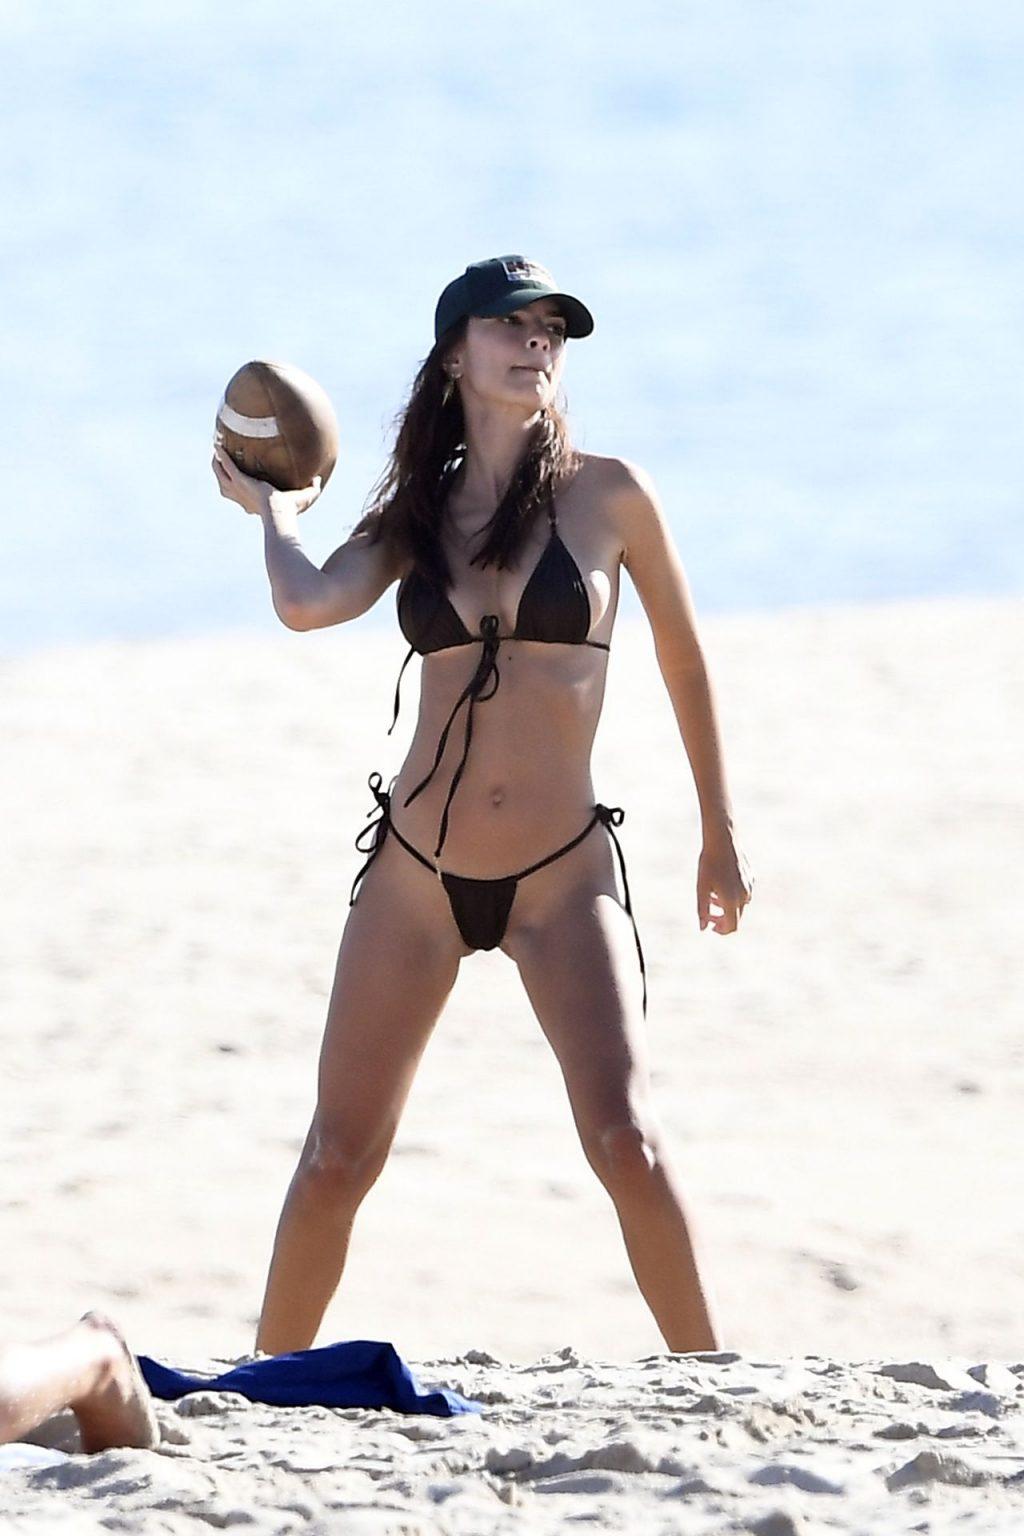 Emily Ratajkowski Plays Football at the Beach (97 Photos)